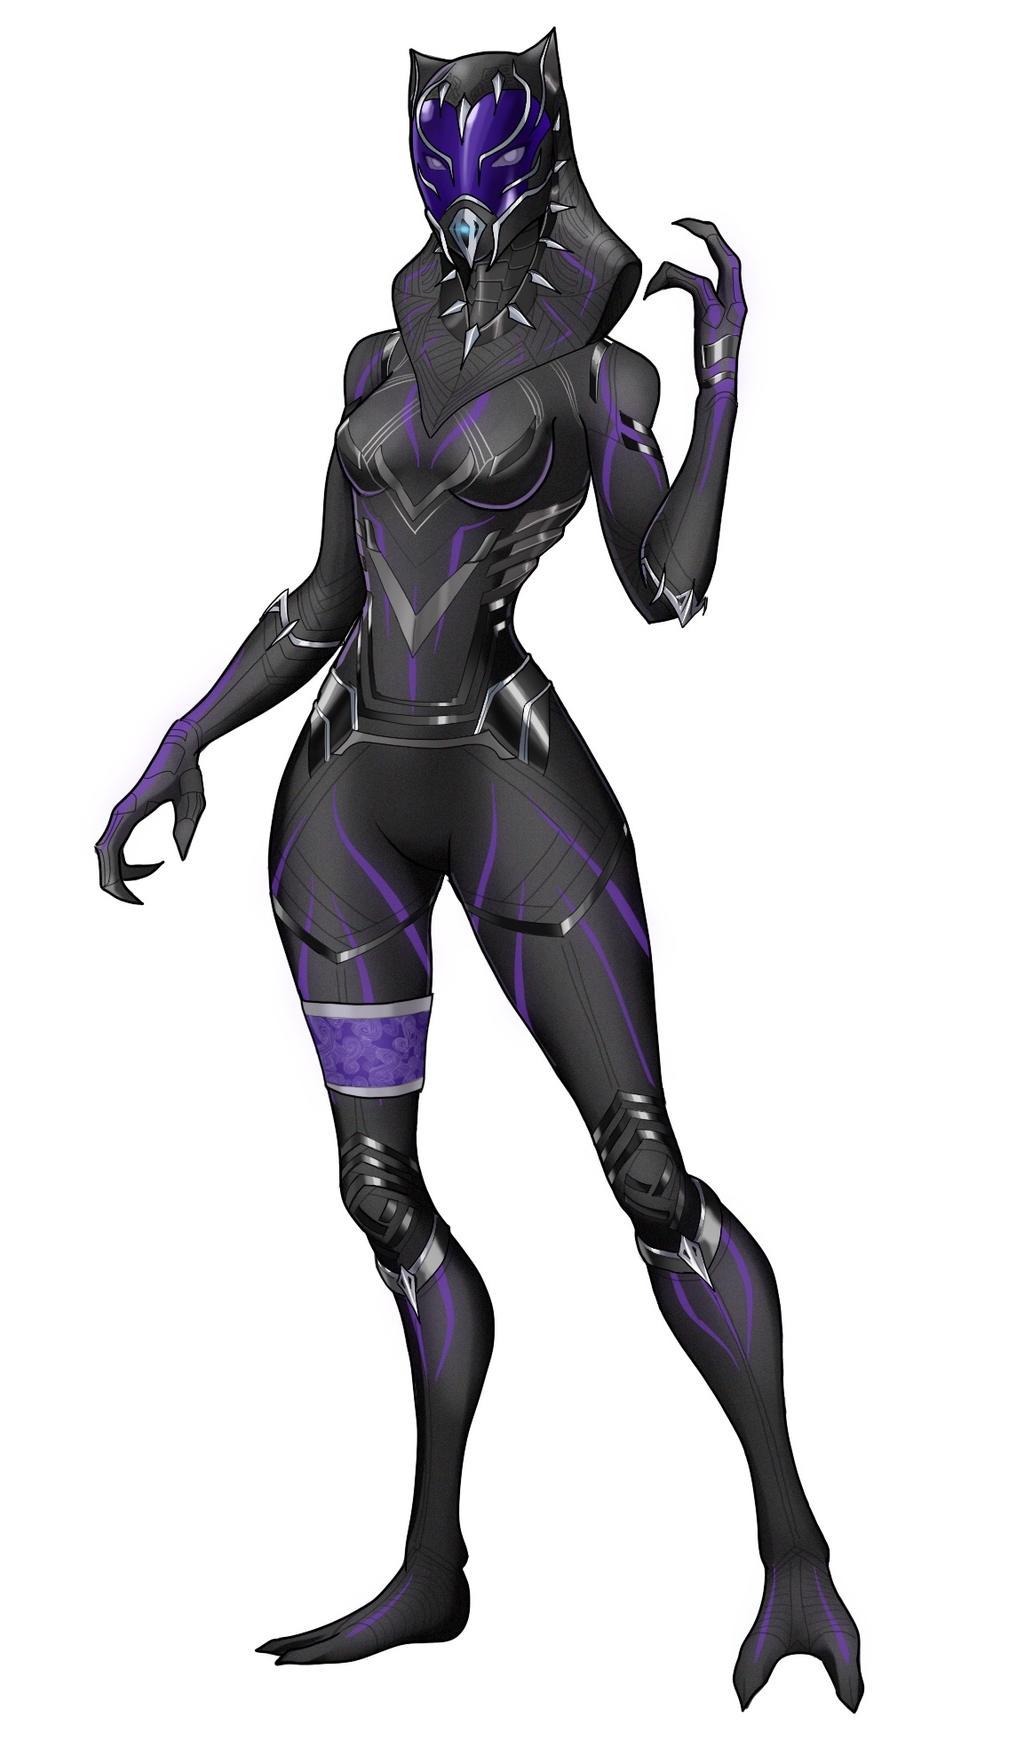 Tali - Black Panter by spaceMAXmarine